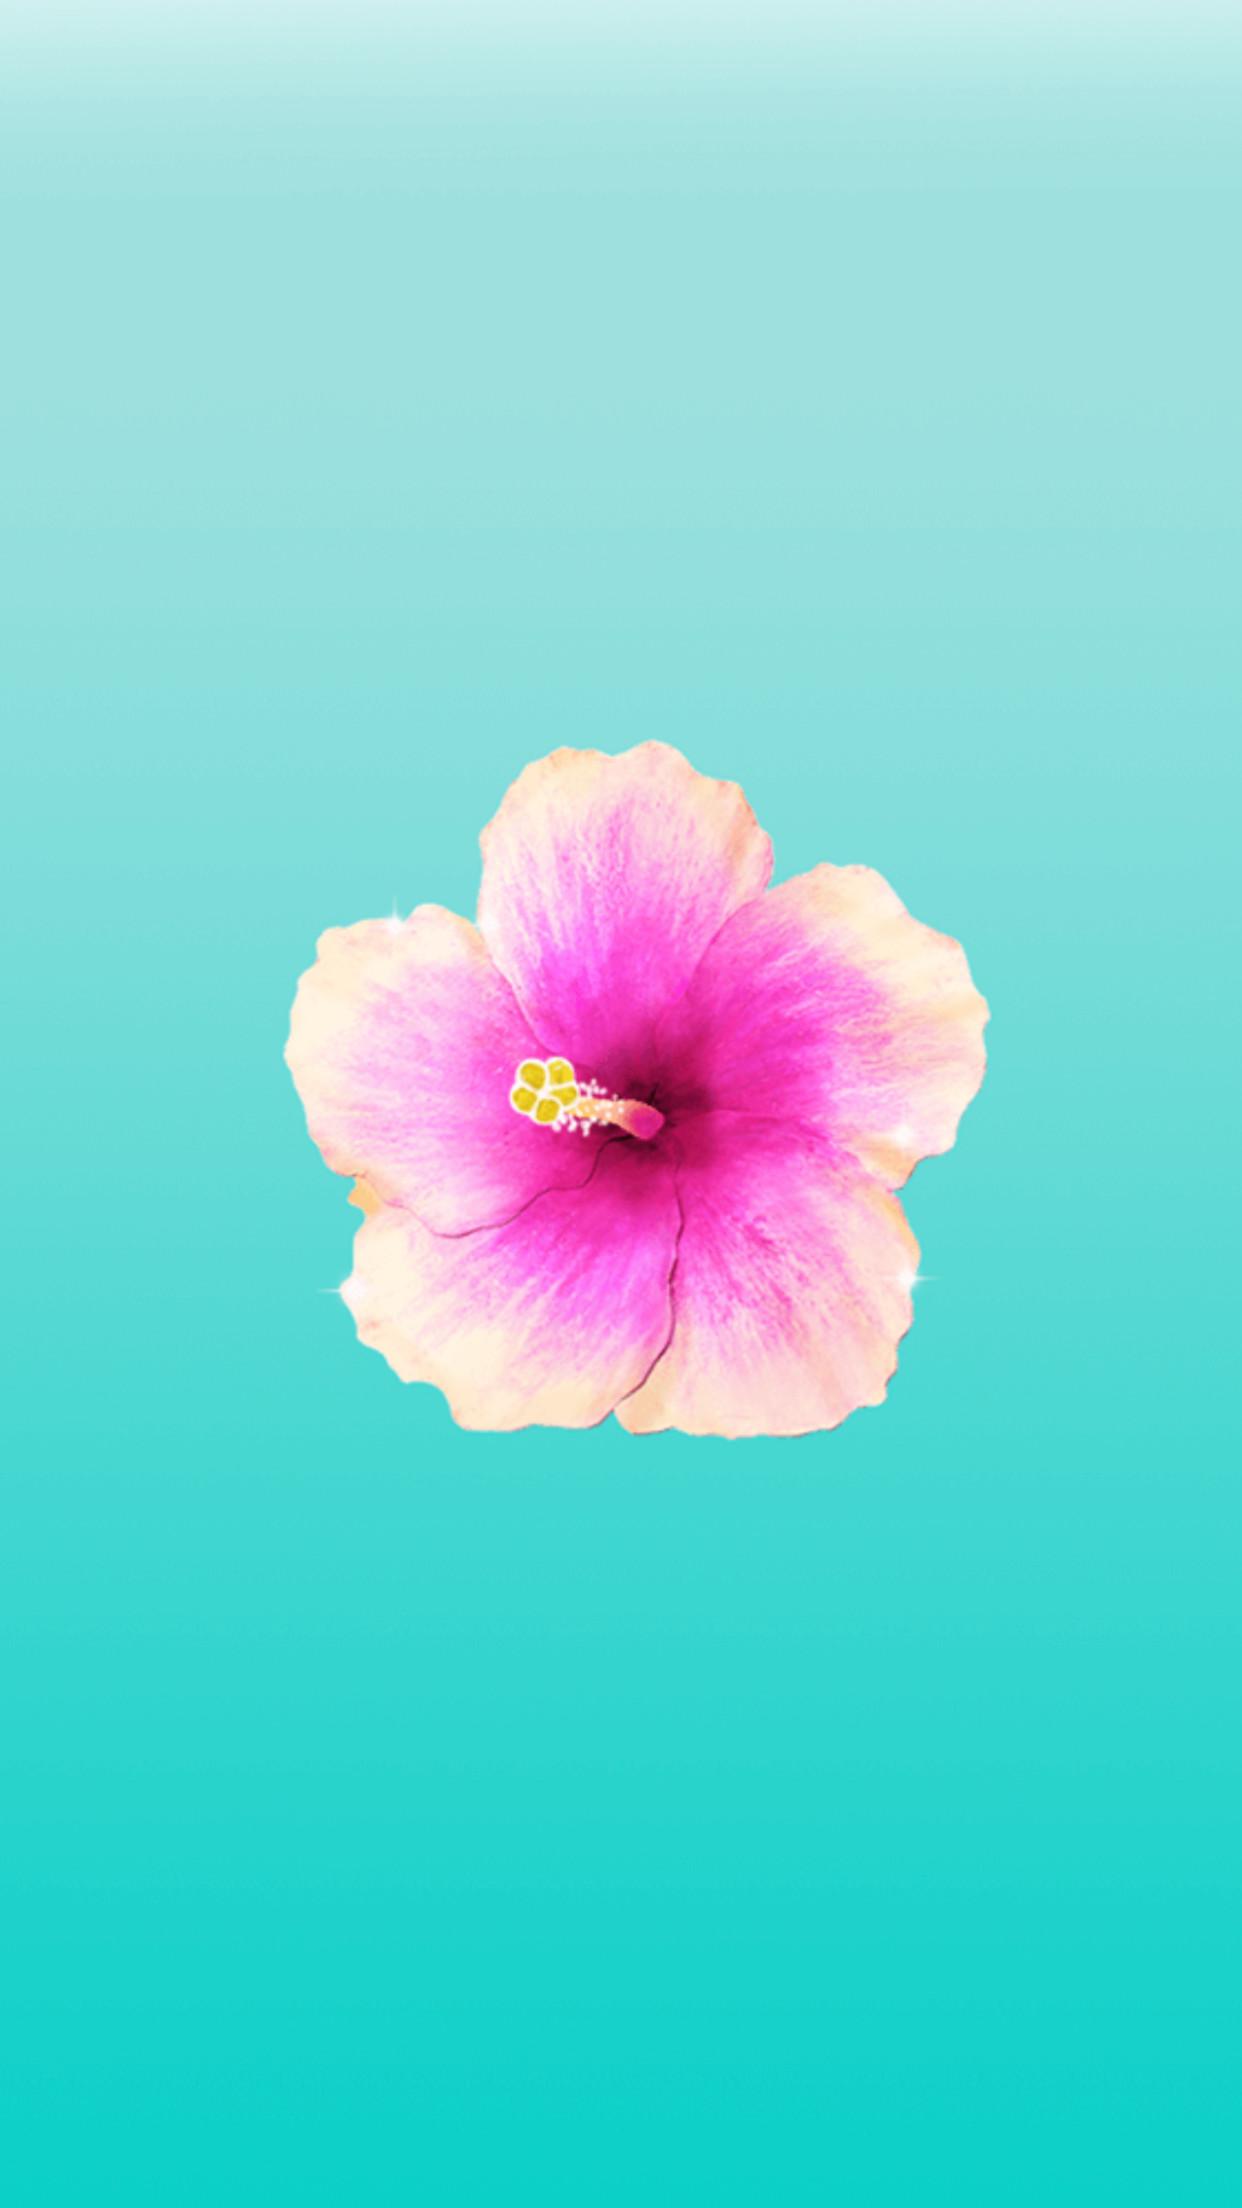 Mint background pink flower